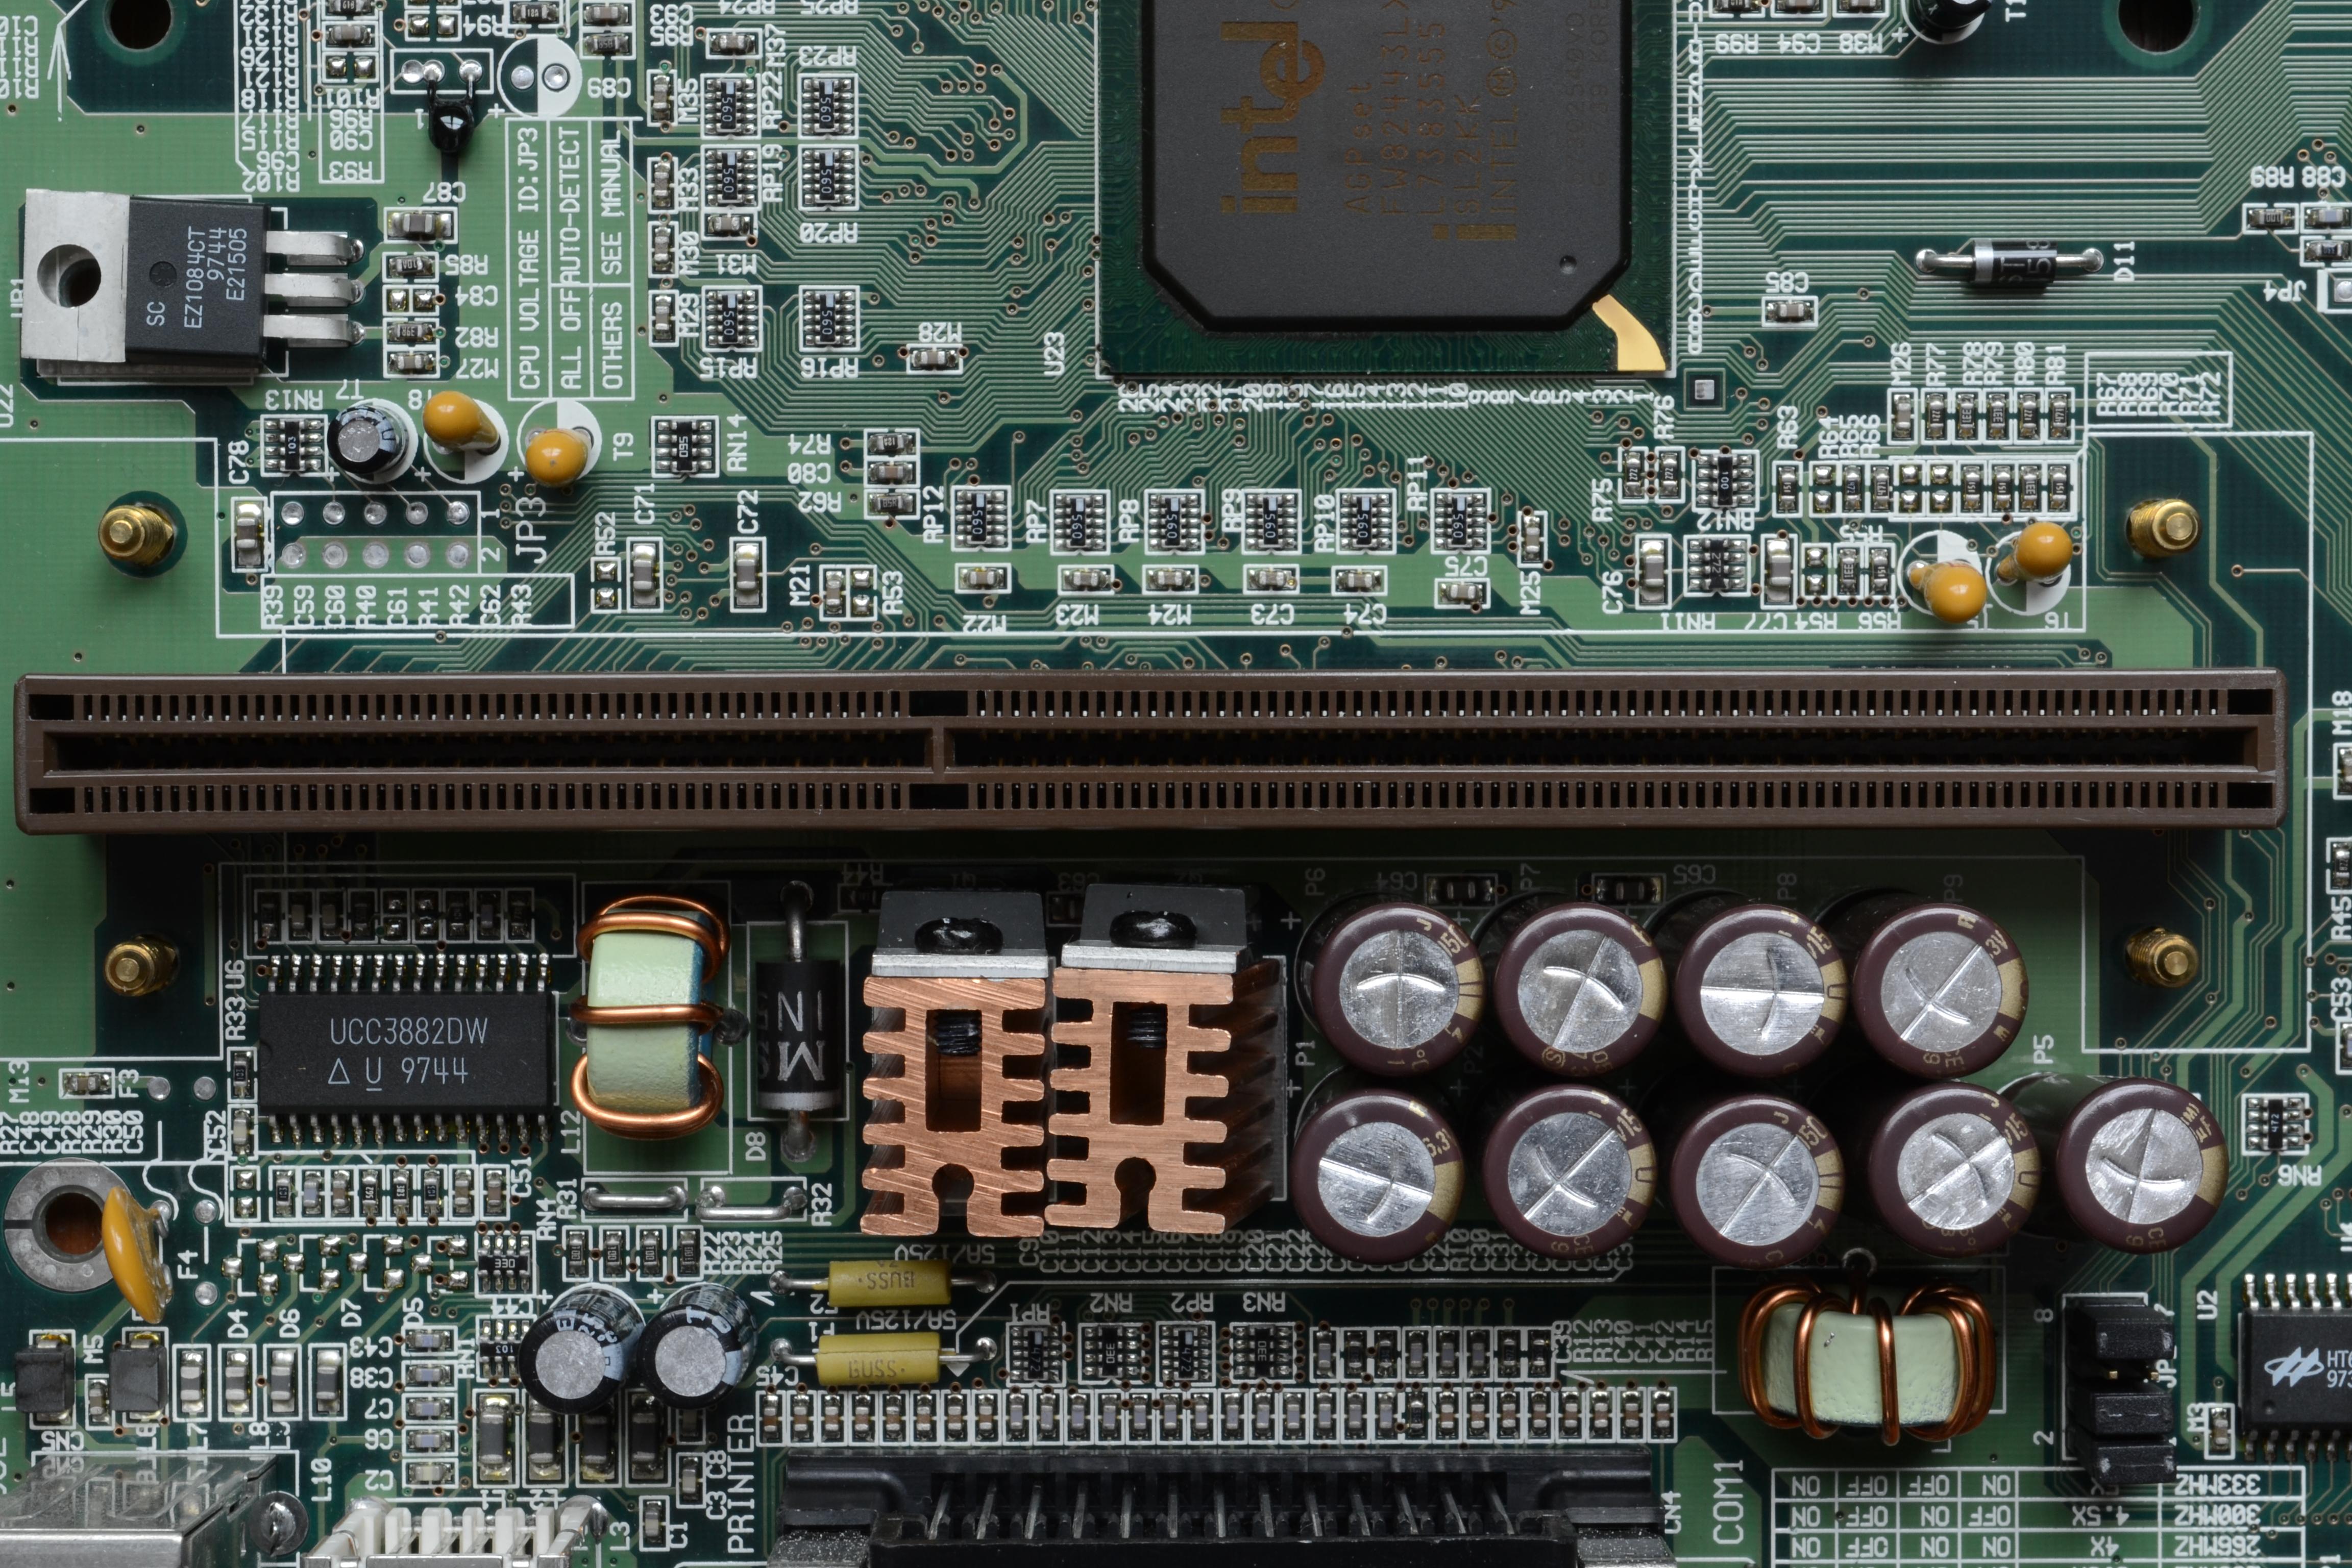 Tyan Trinity 400 S1854 - motherboard - ATX - Pro133A - Slot 1 ...